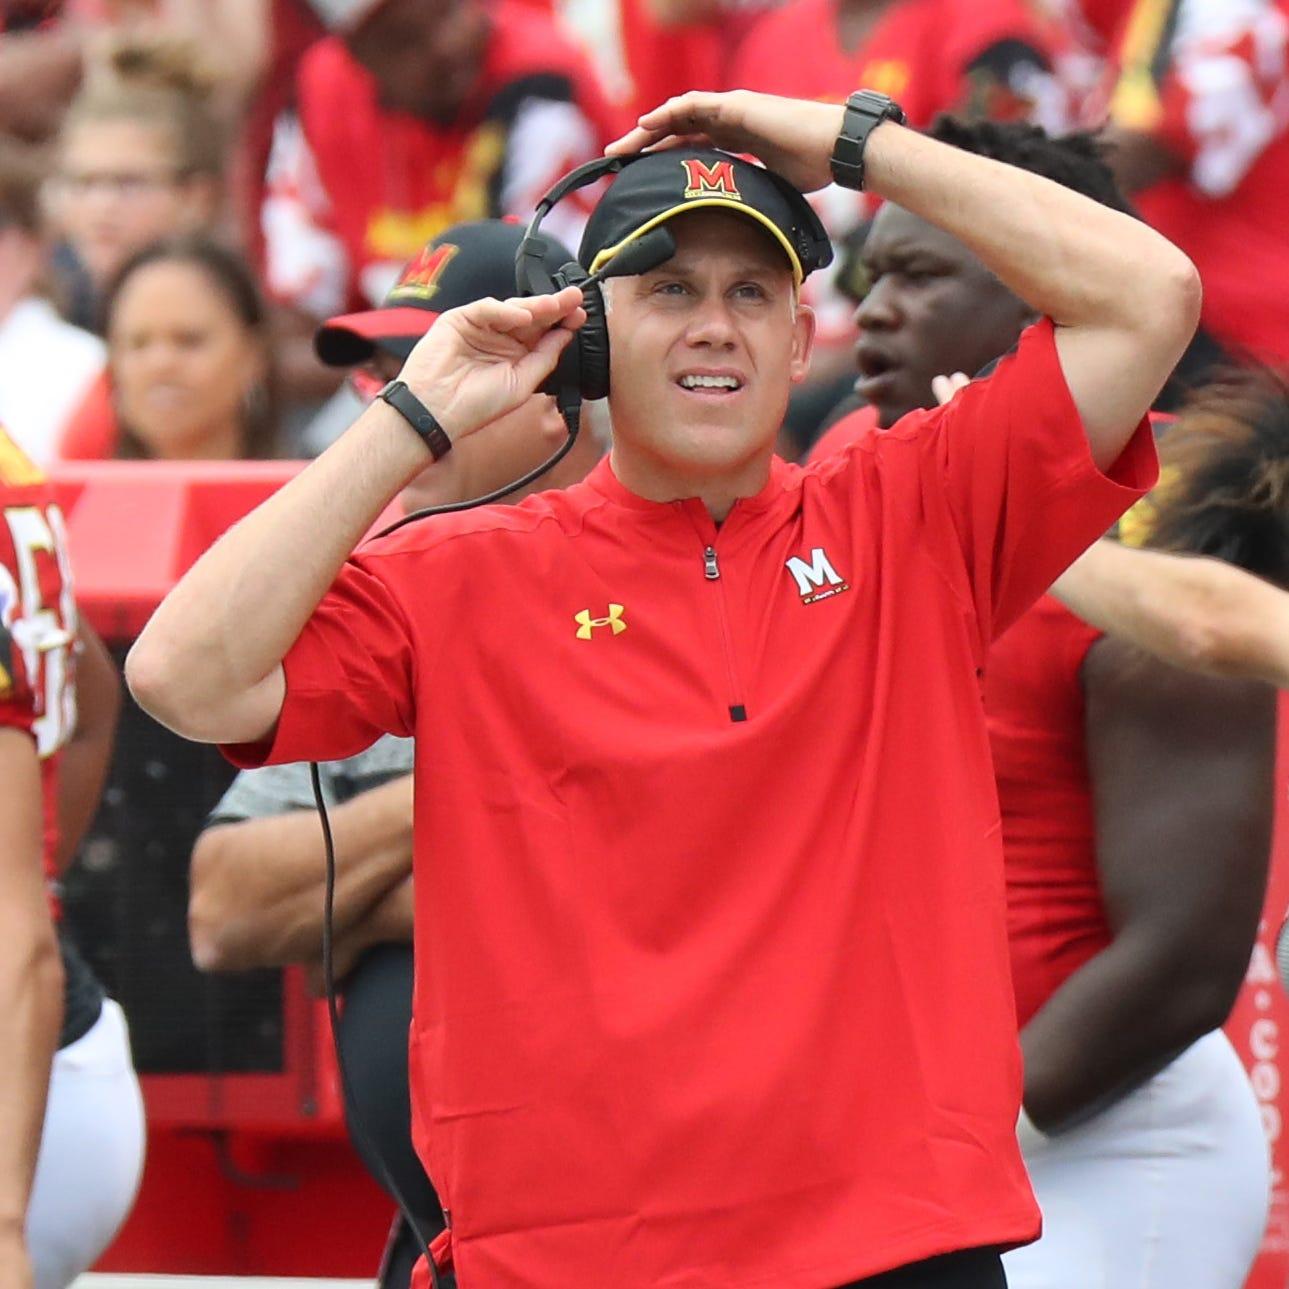 Maryland coach DJ Durkin